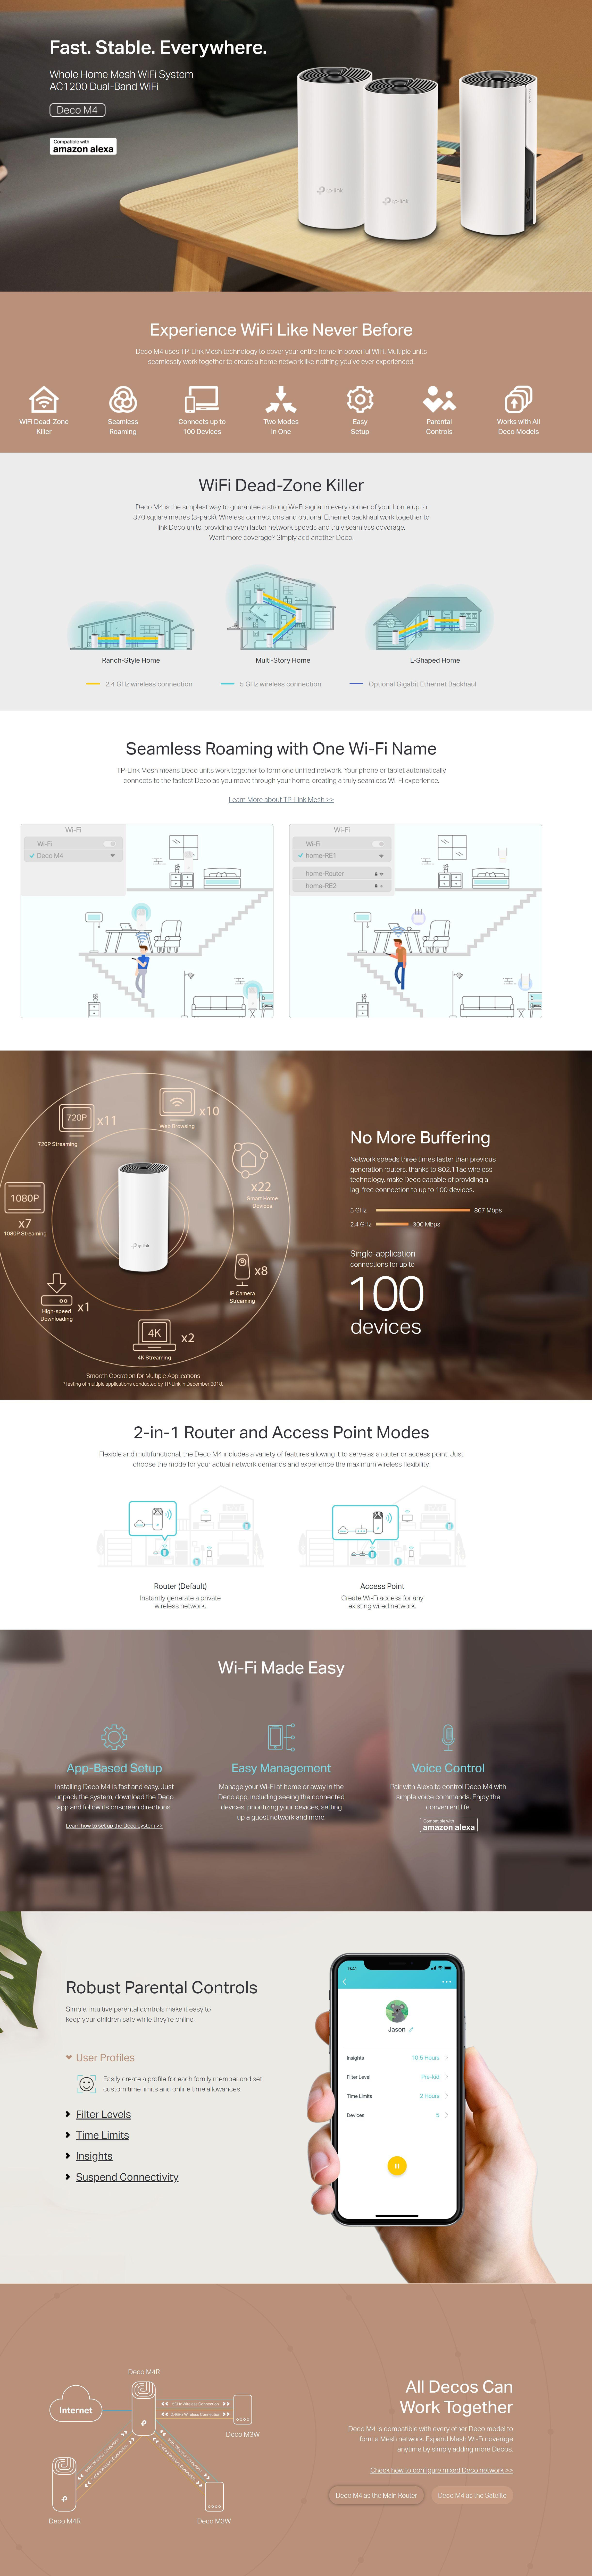 #1523 - 'Deco M4(3-pack) I AC1200 Deco Whole Home Mesh WiFi System I TP-Link Australia' - www_tp-link_com.jpg